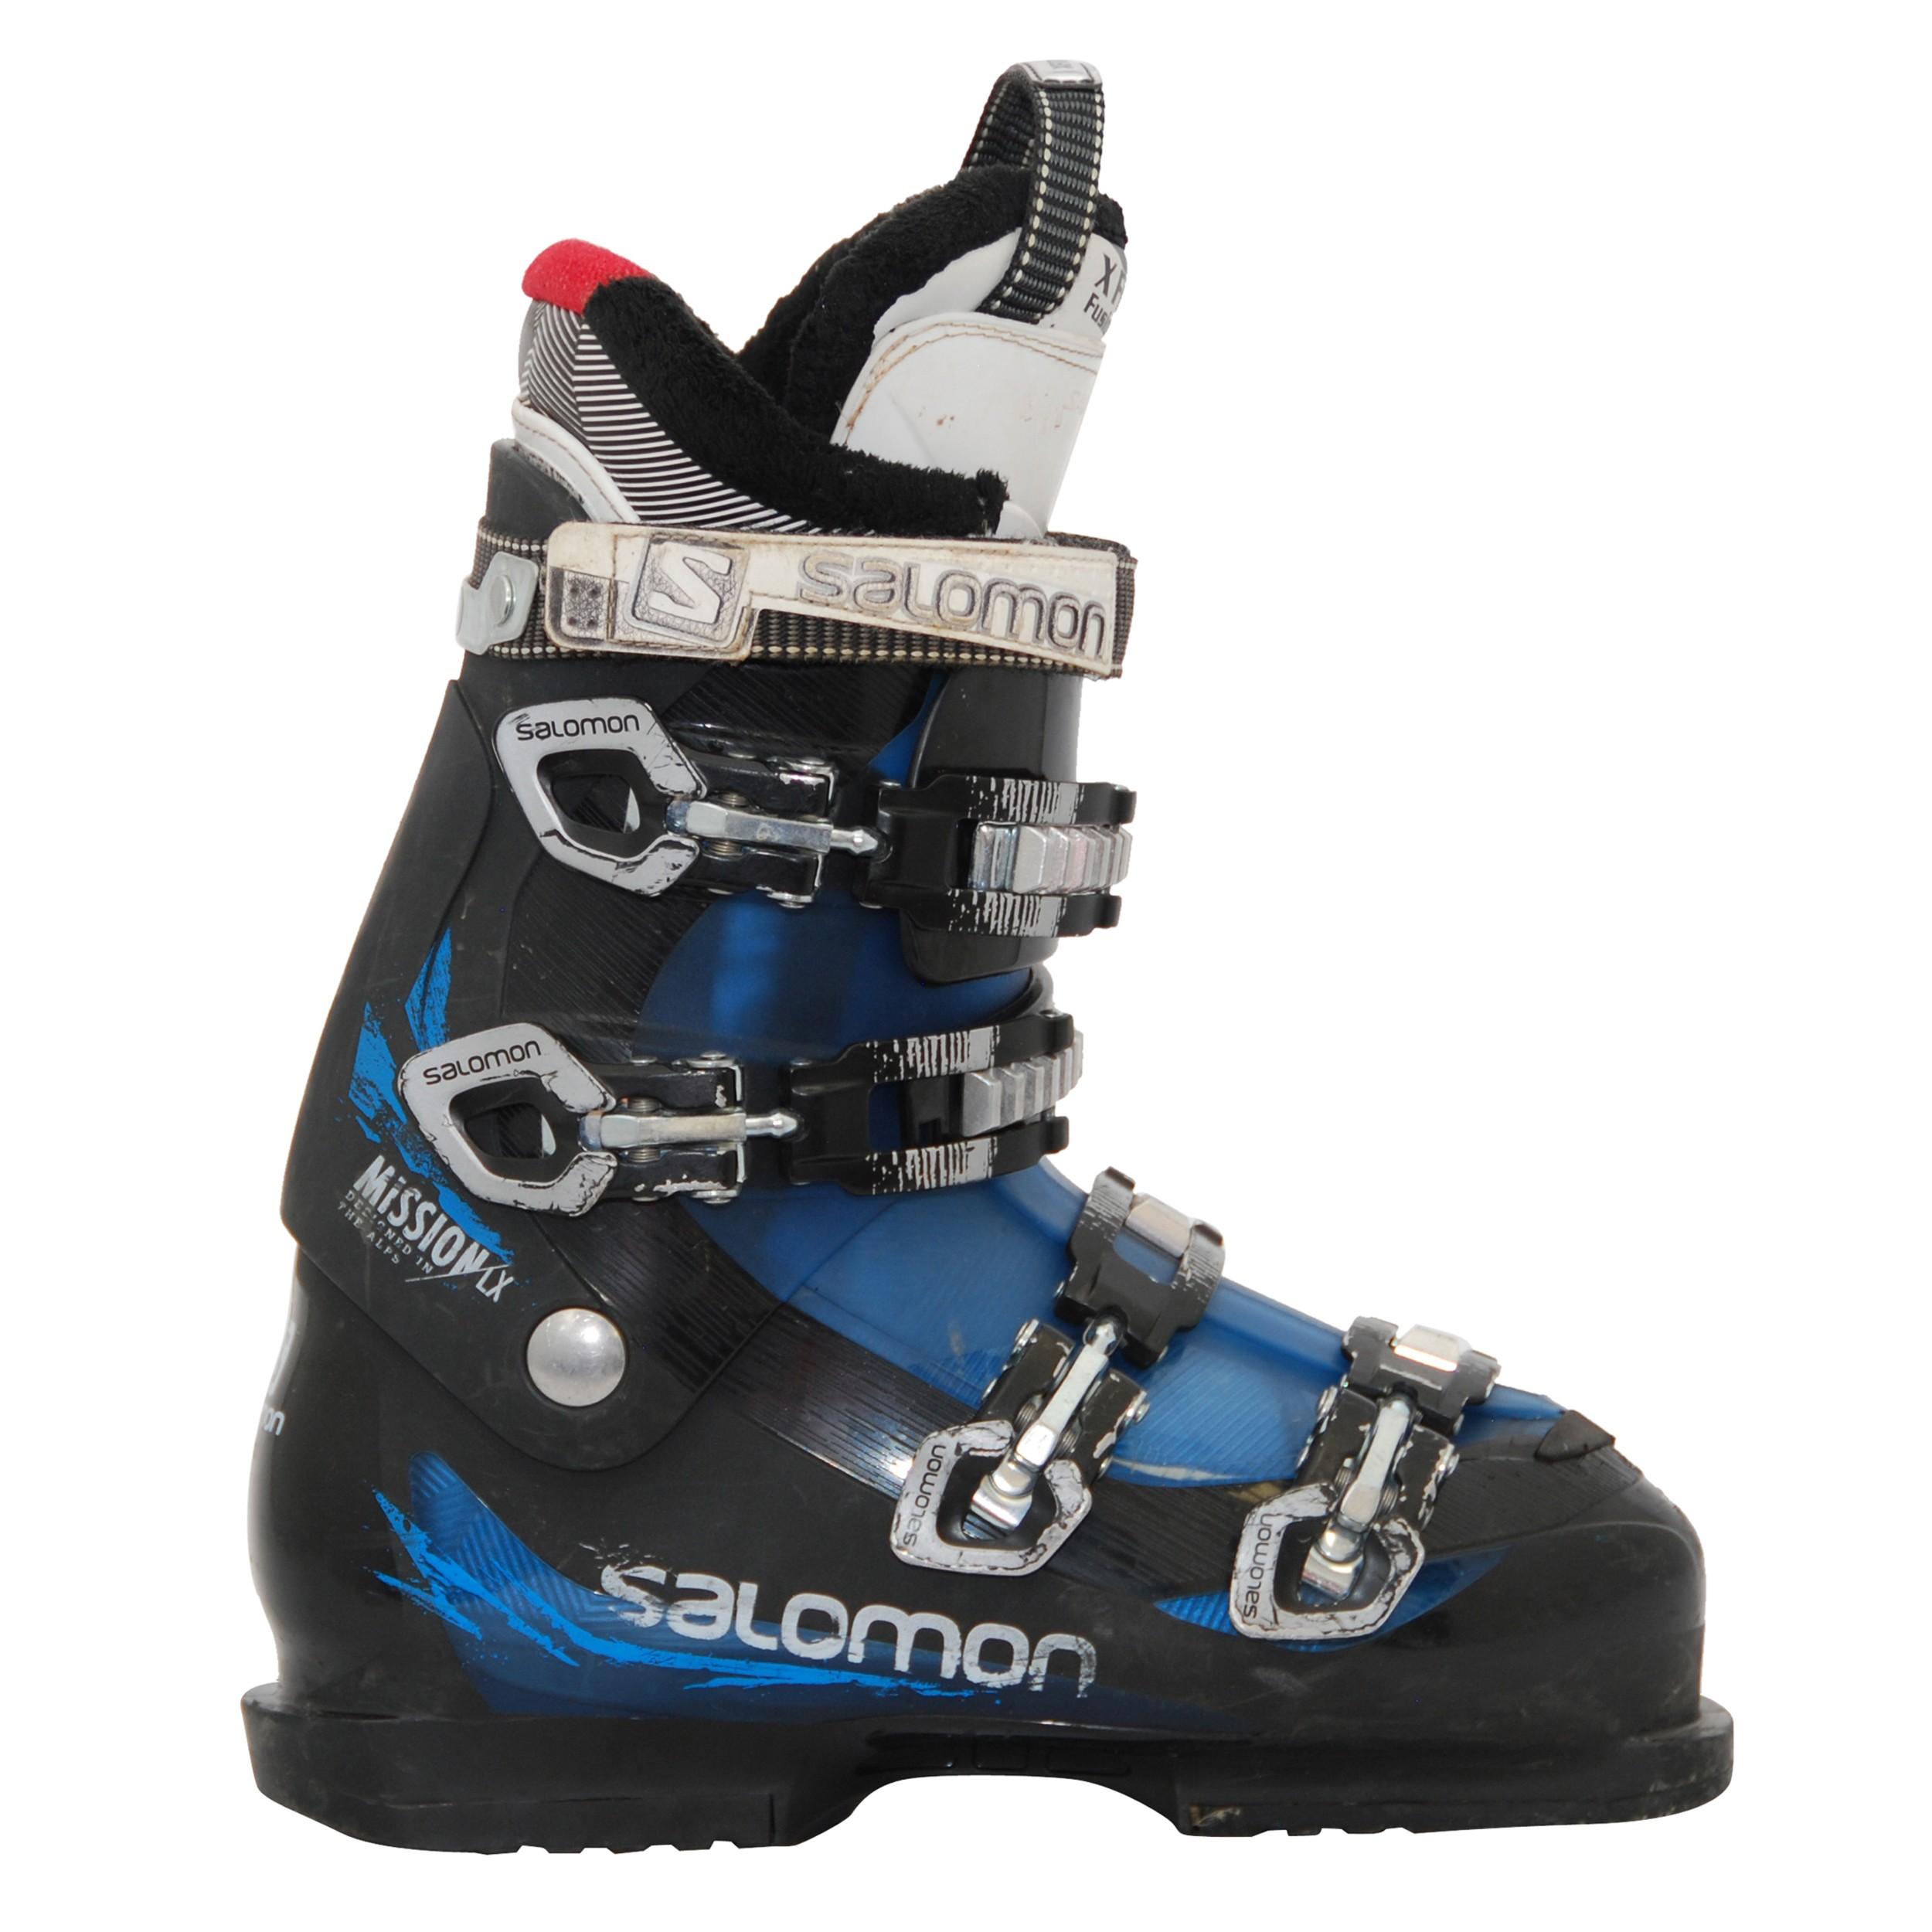 factory price 100% authentic wholesale price Chaussure de ski Occasion Salomon Mission RT blanc